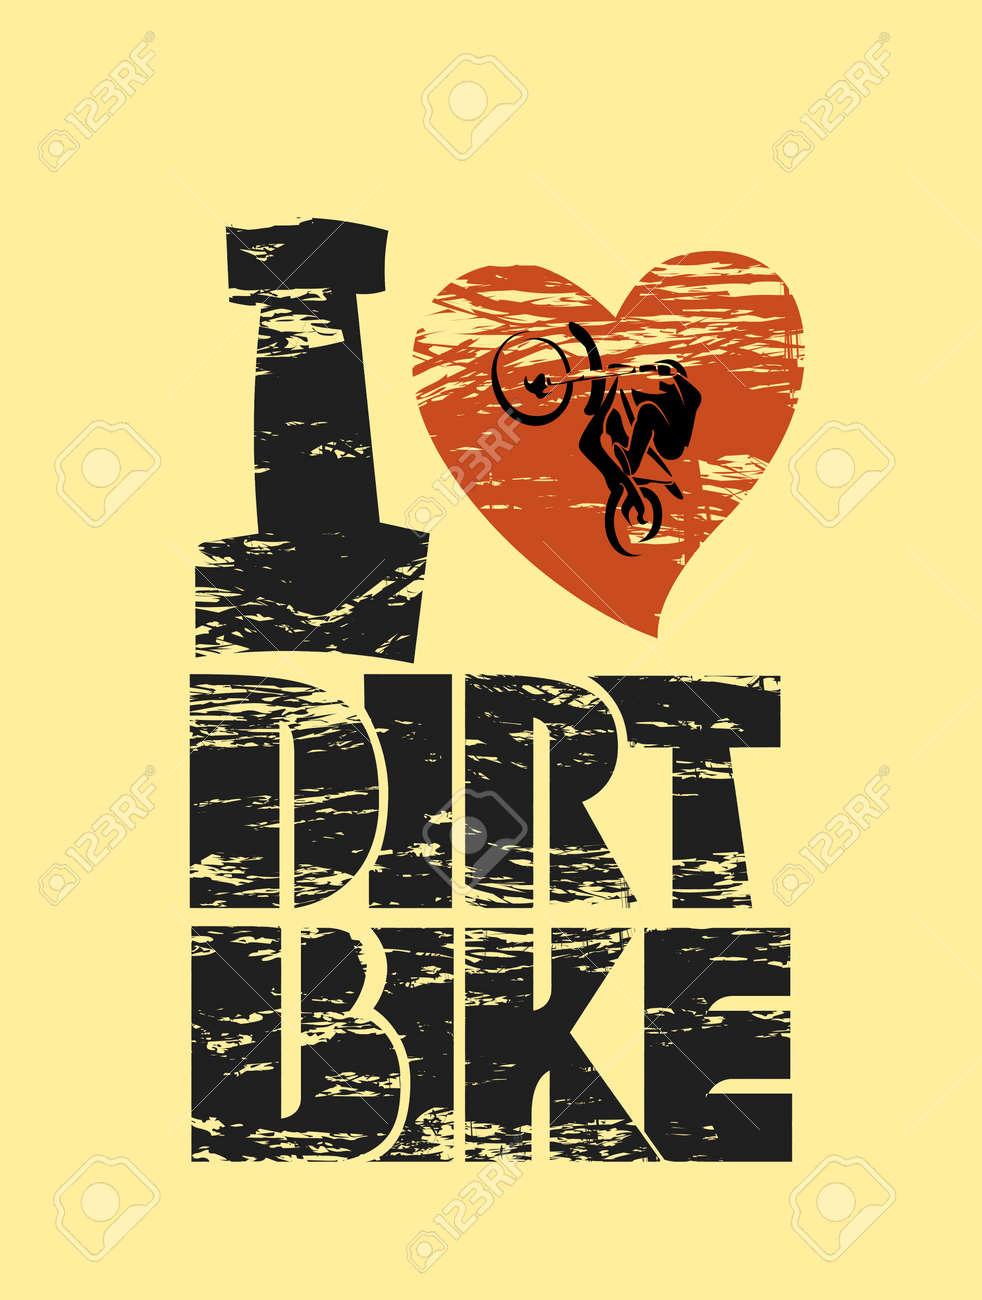 dirt bike clipart.html